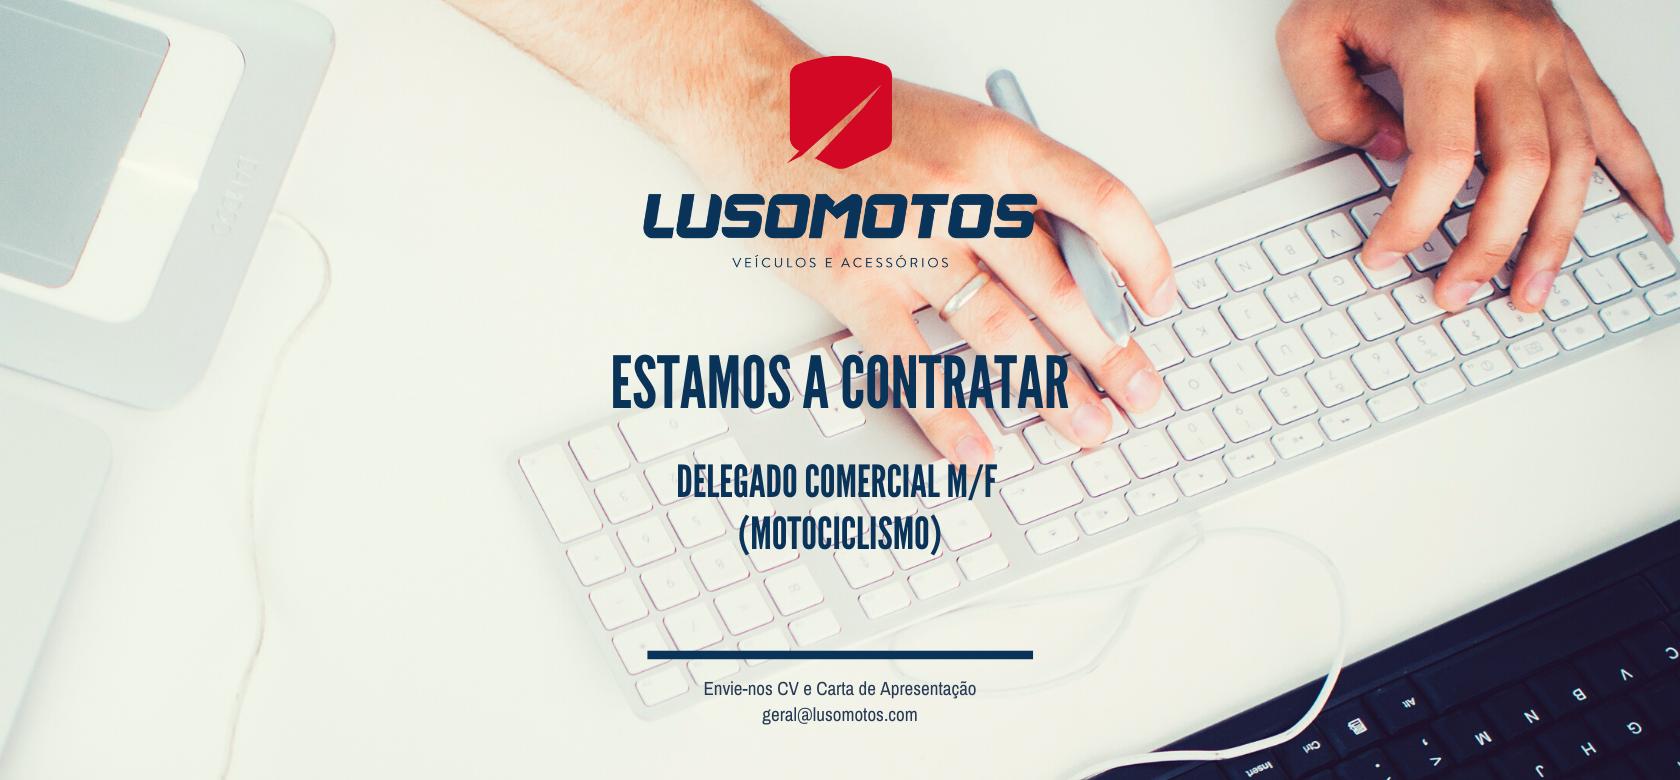 DELEGADO COMERCIAL MOTOCICLISMO (M/F) 0